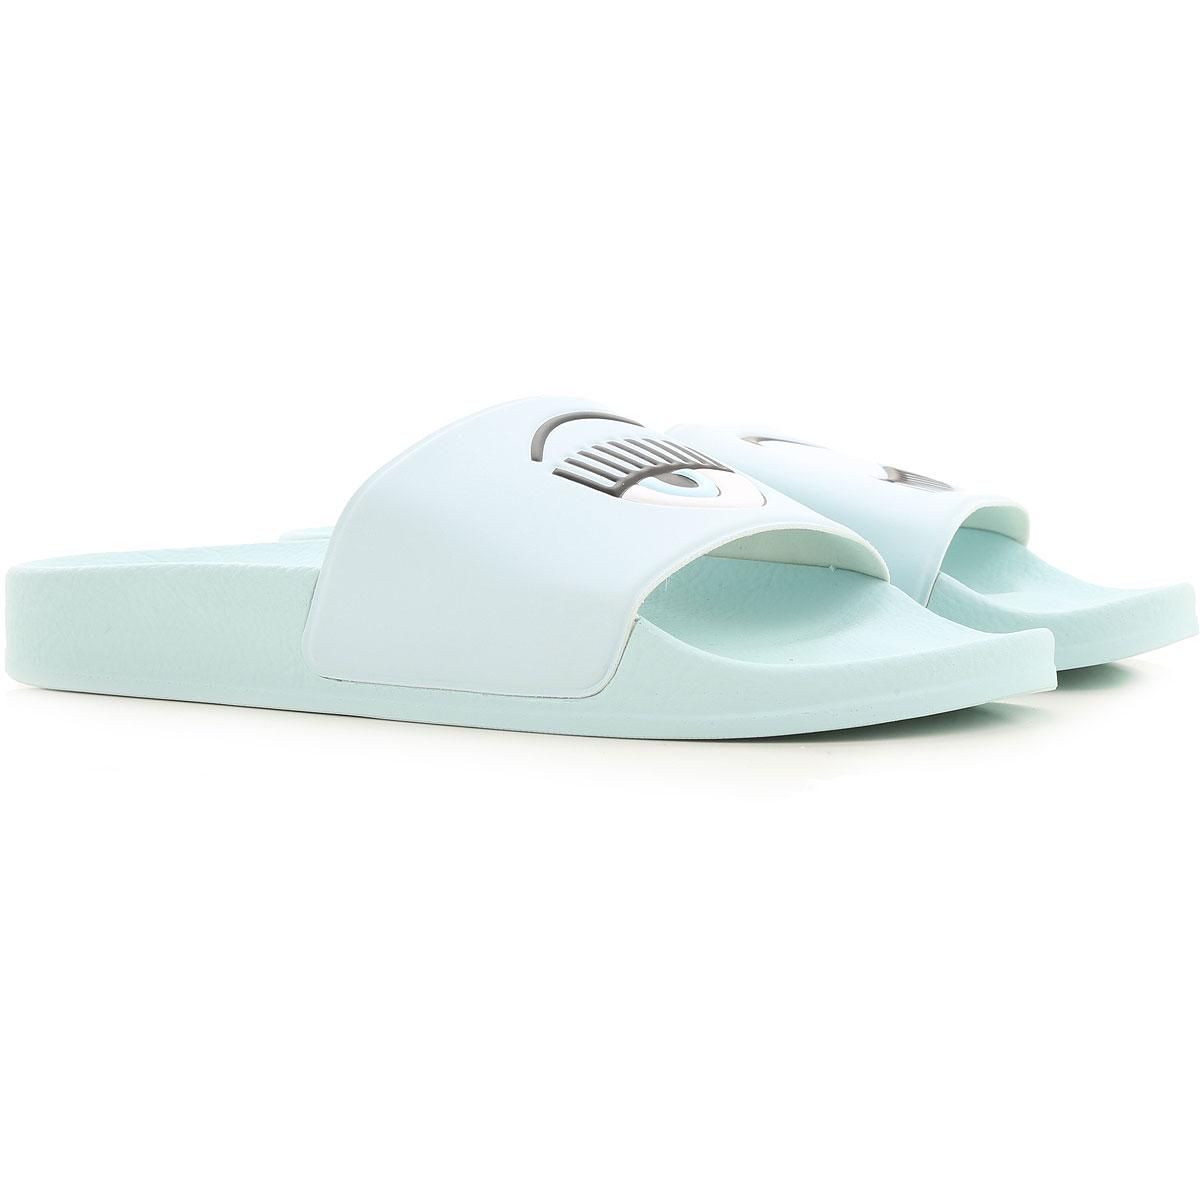 Chiara Ferragni Sandals for Women On Sale, Sky, Eco Leather, 2019, 11 6 9